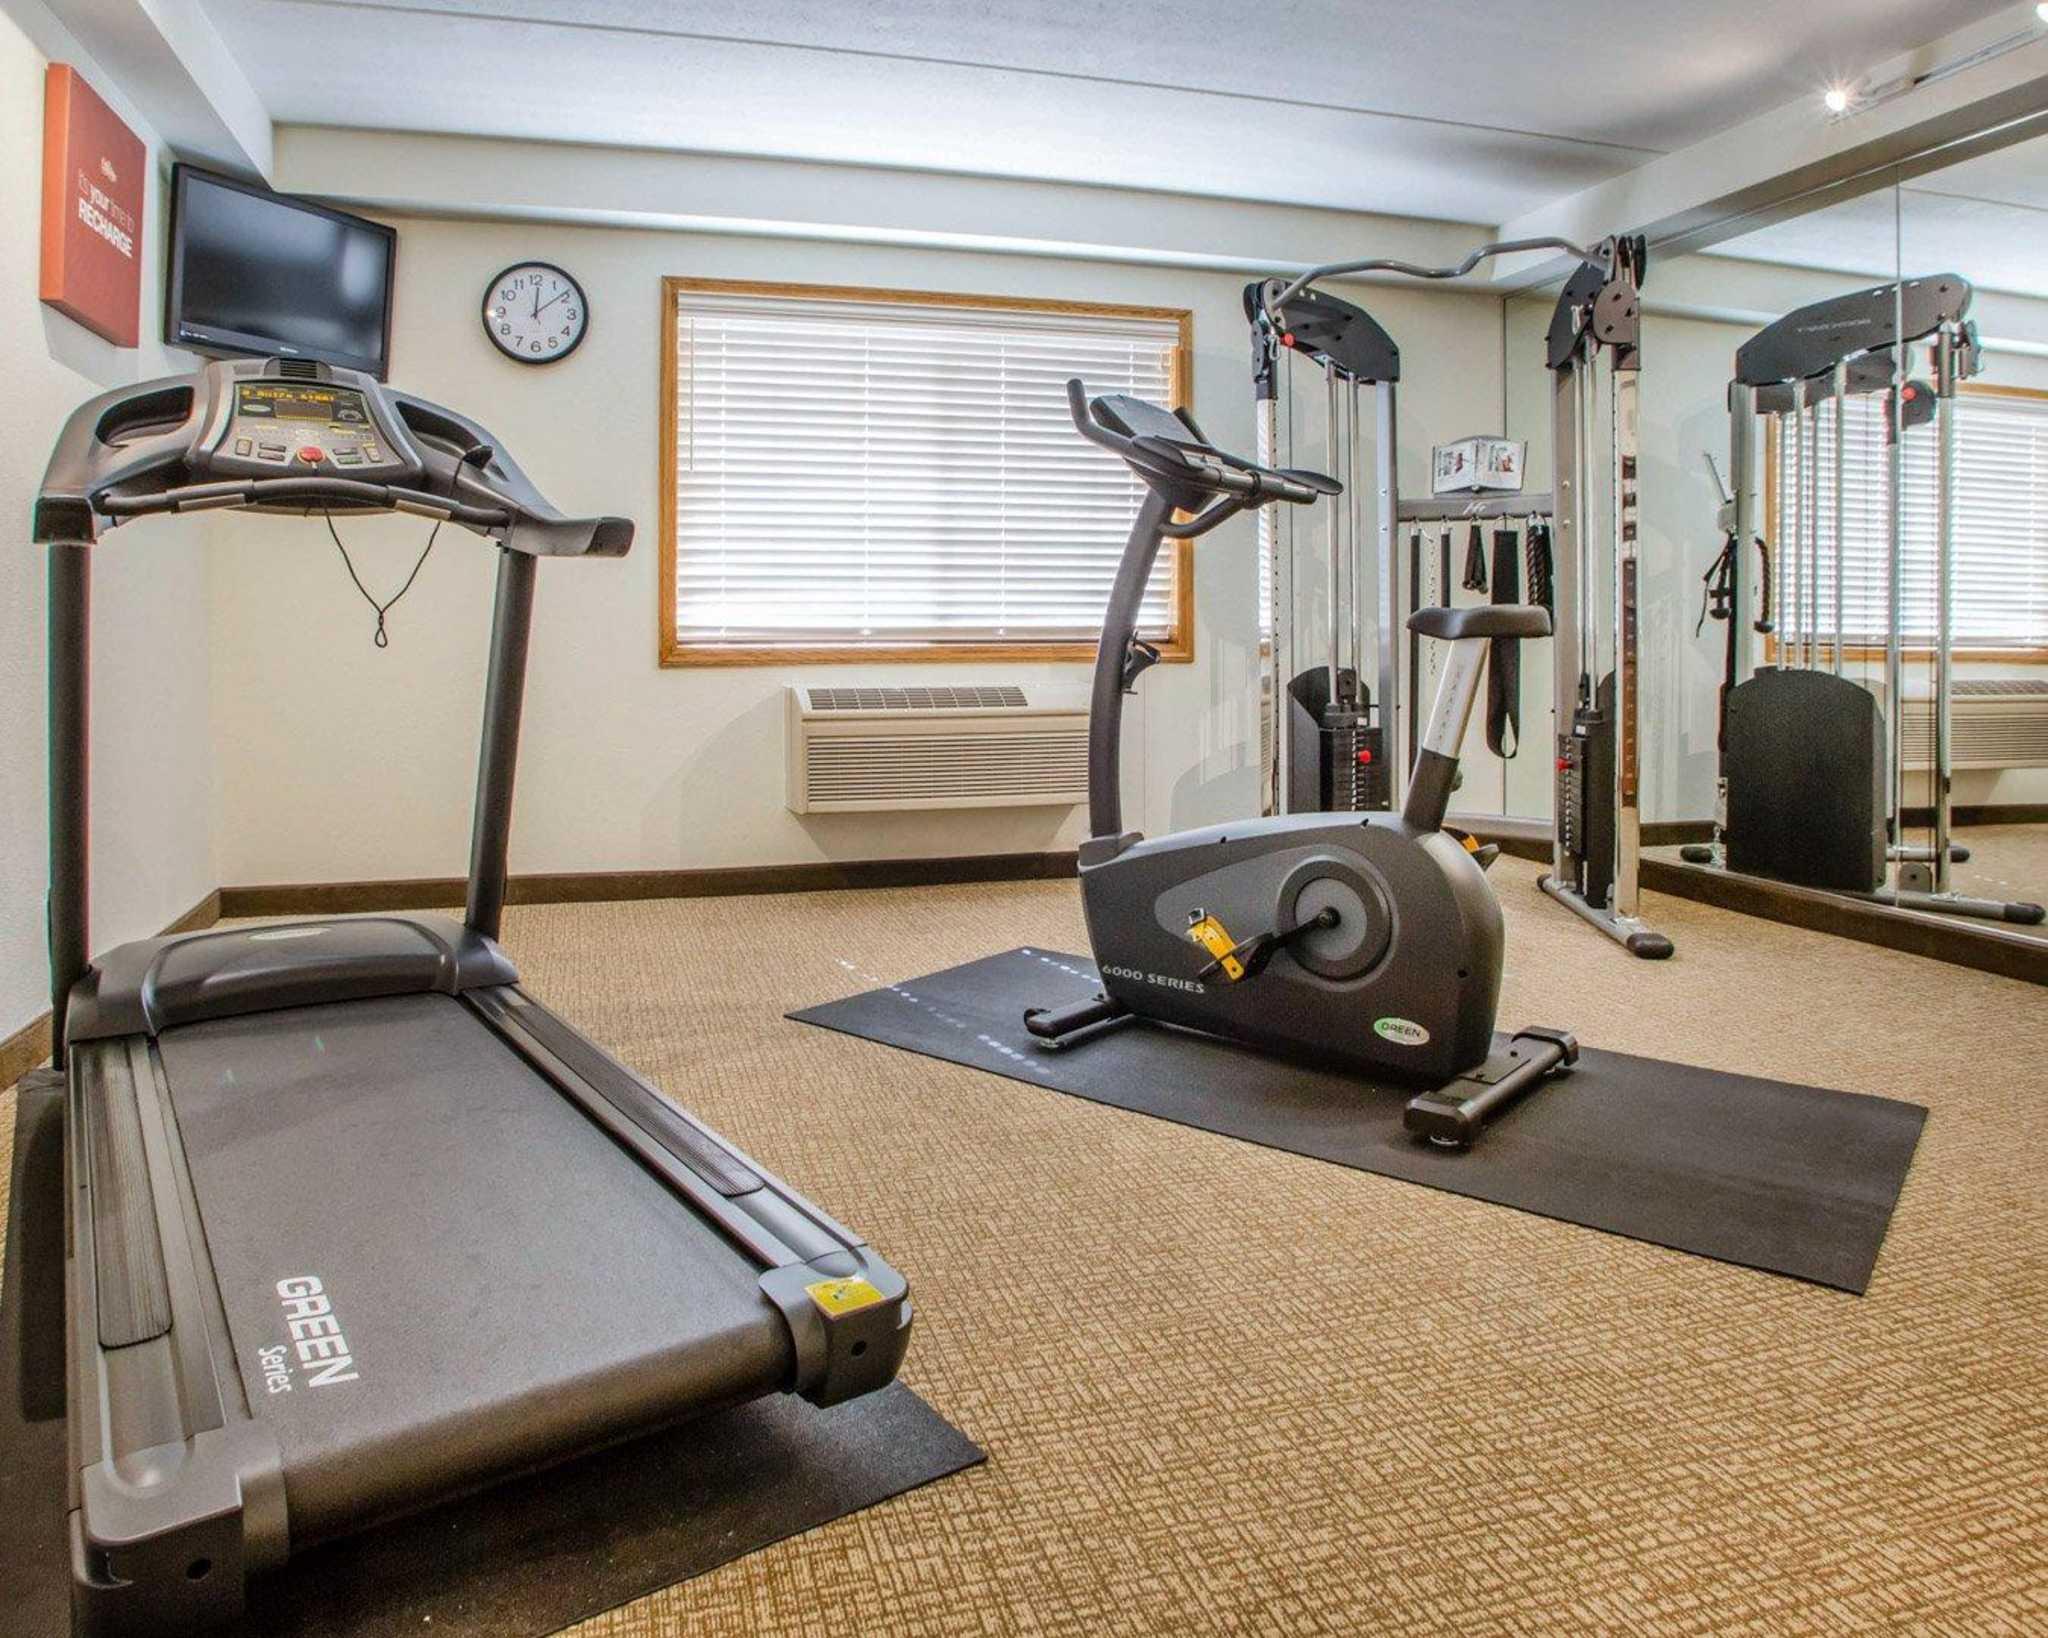 Comfort Inn & Suites Jackson - West Bend image 29